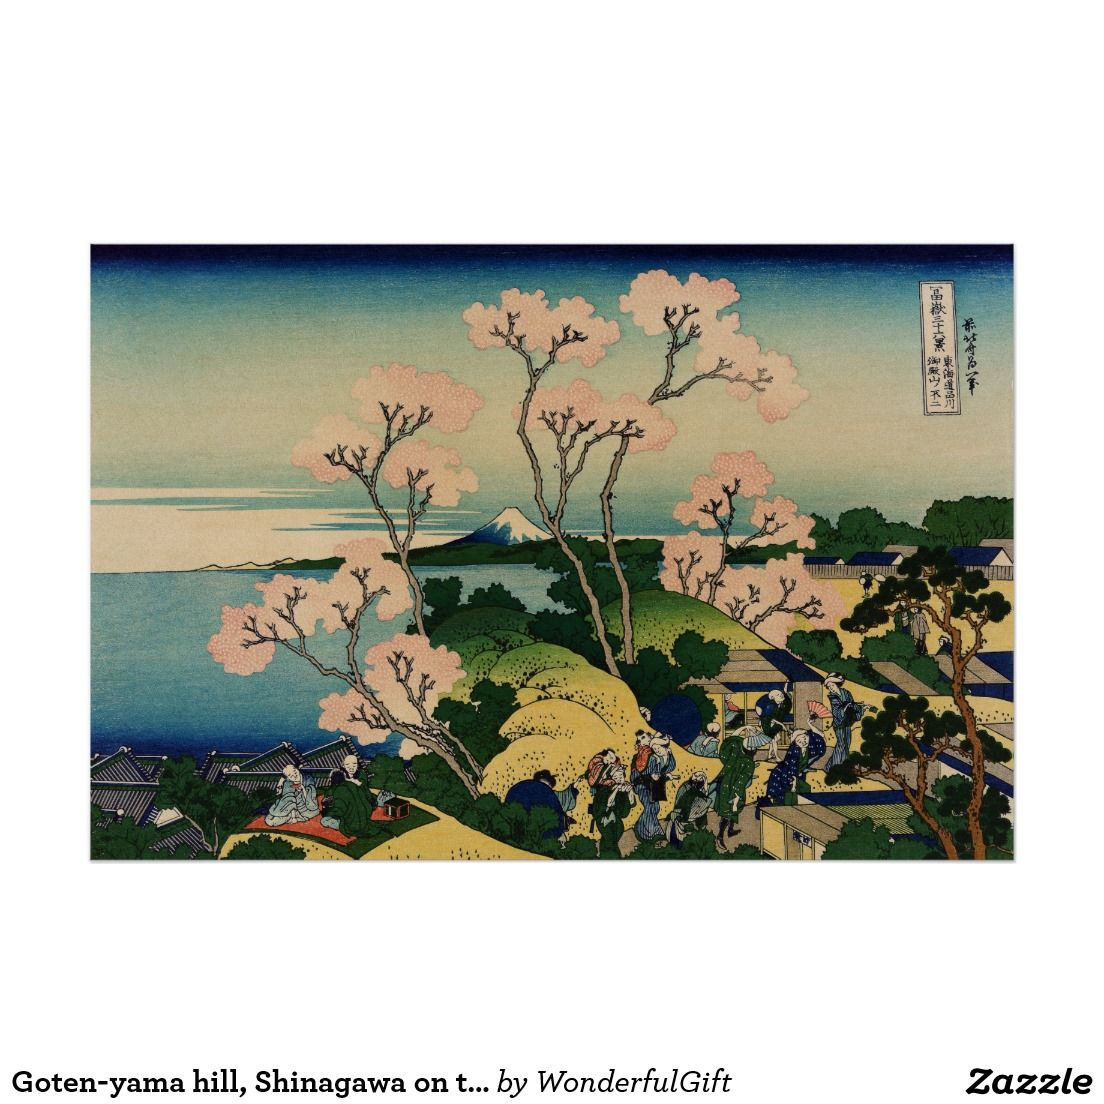 Goten-yama hill, Shinagawa on the Tōkaidō. Poster